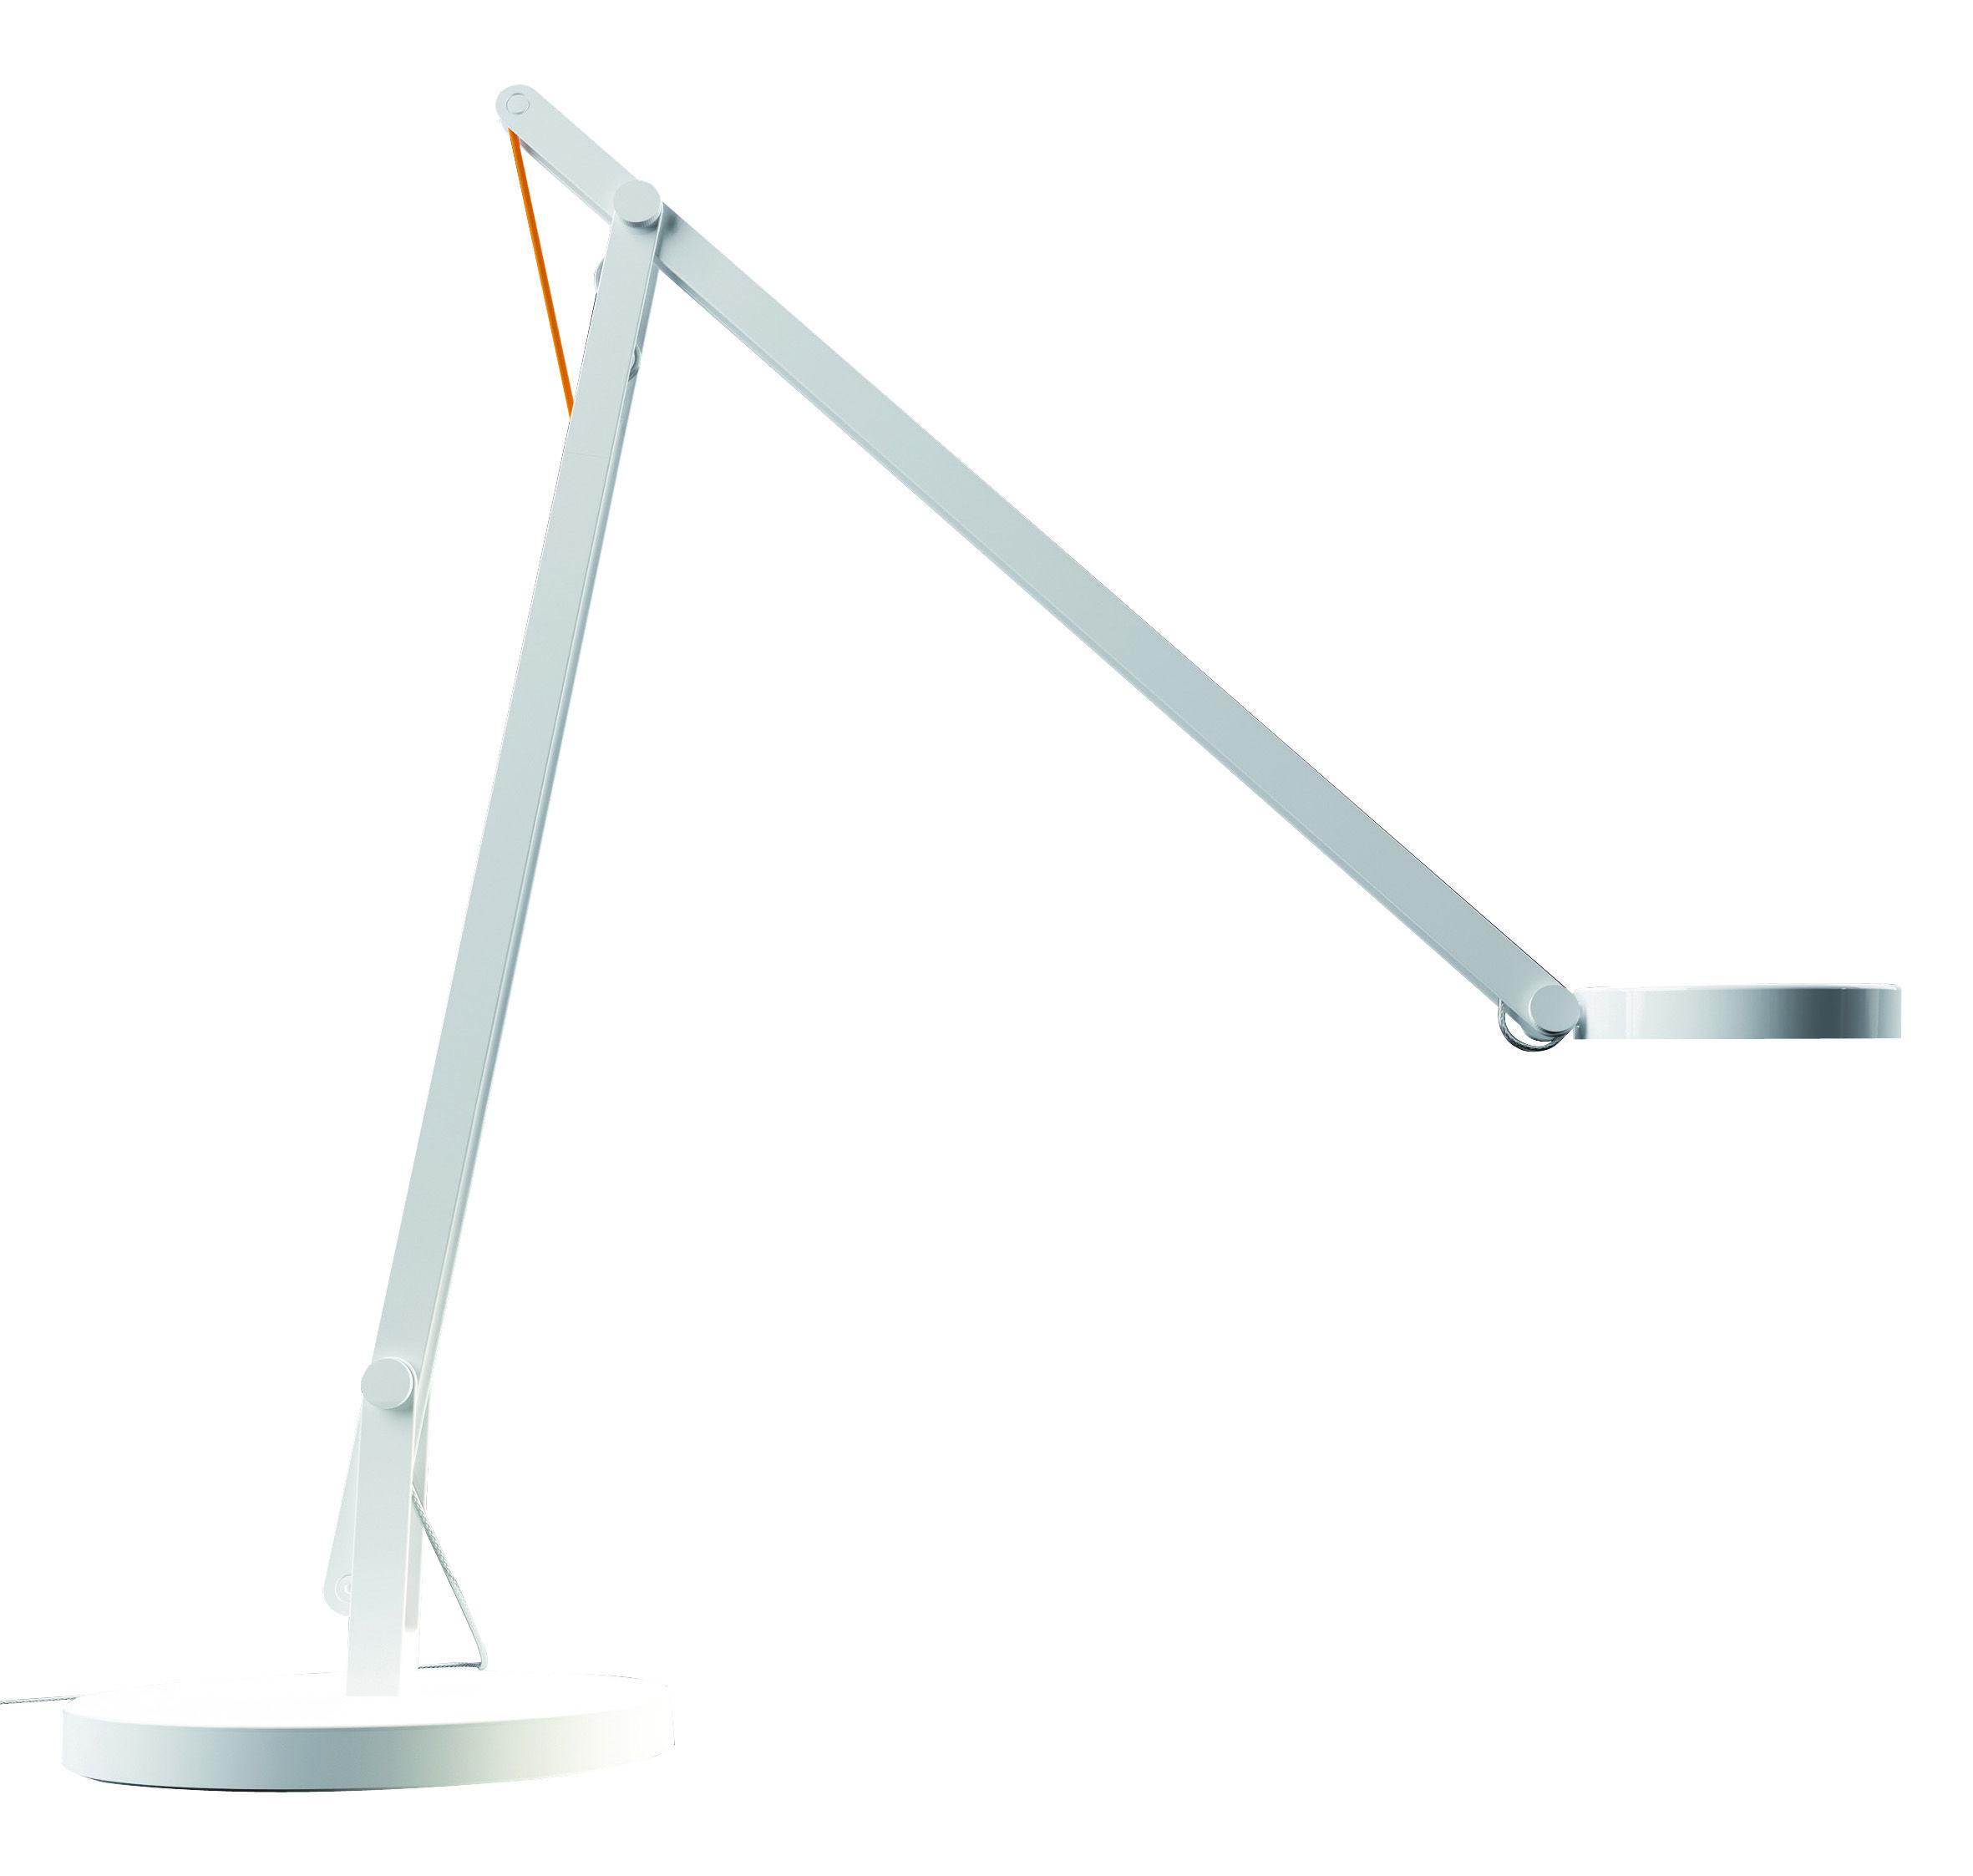 lampe de table string t1 led blanc c ble orange rotaliana. Black Bedroom Furniture Sets. Home Design Ideas